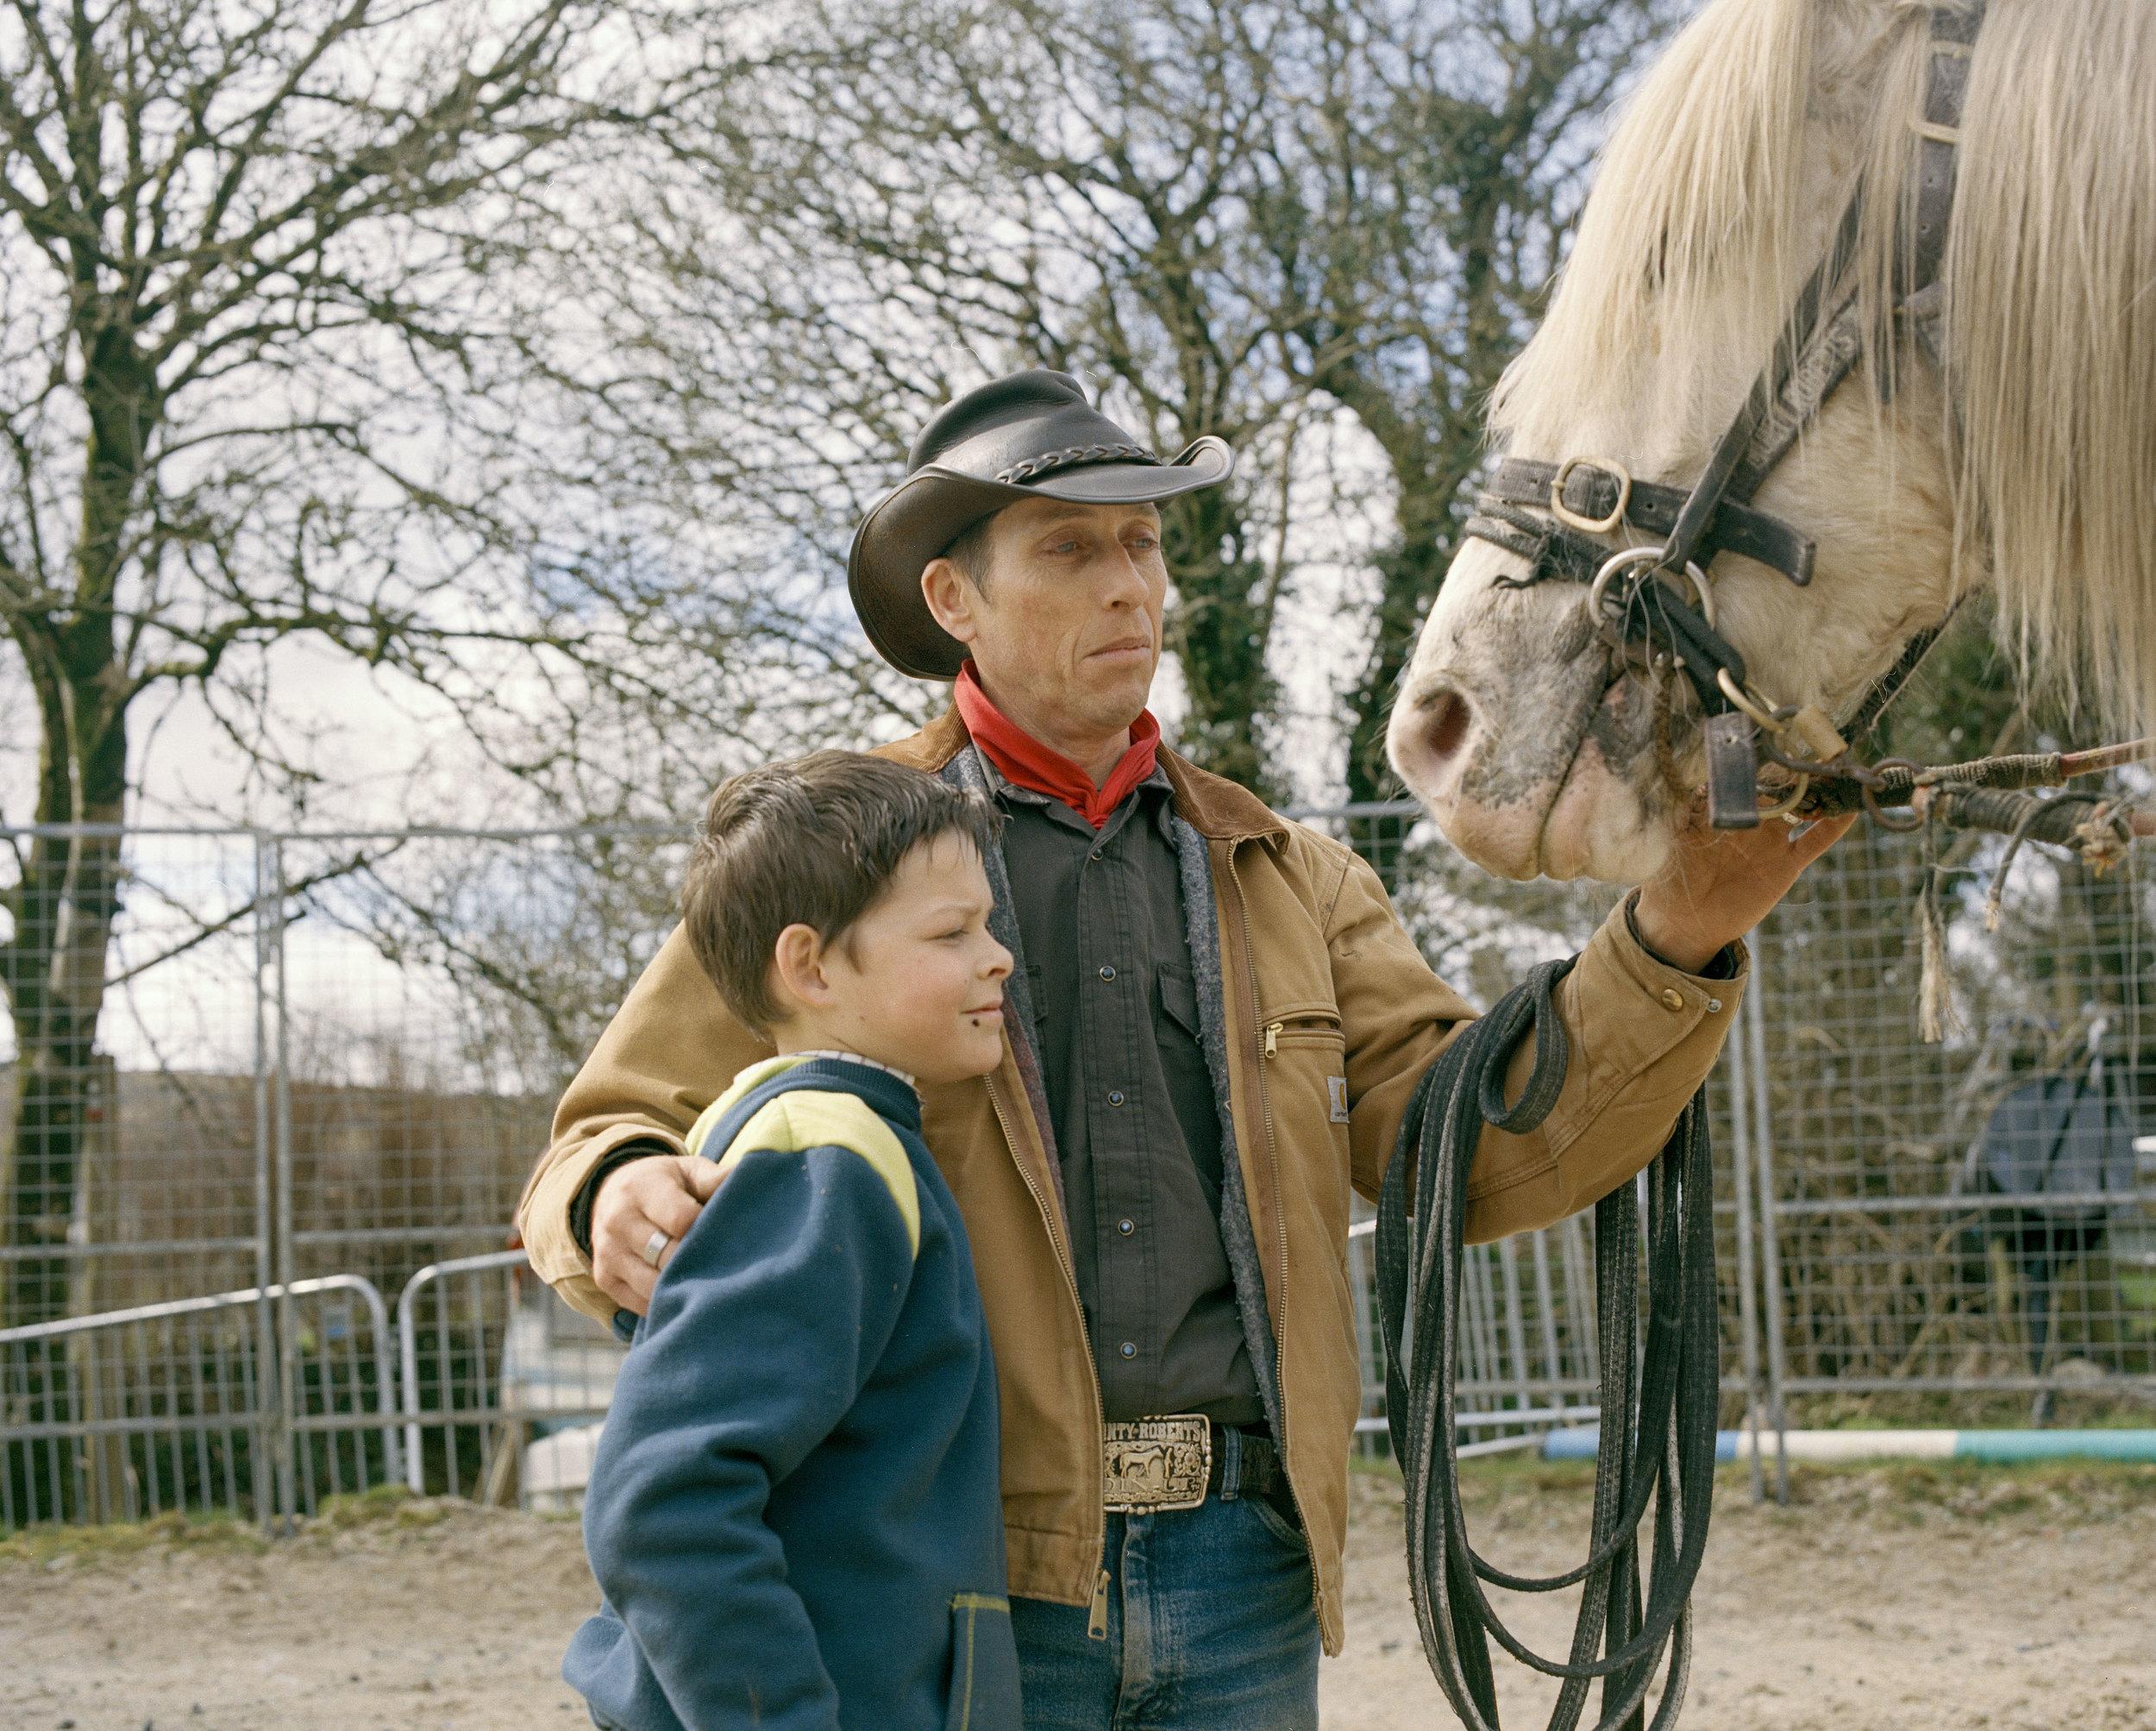 Dan Wilson and his Son, Callum Wilson getting Dan's horse ready to ride on the moor above their farm.